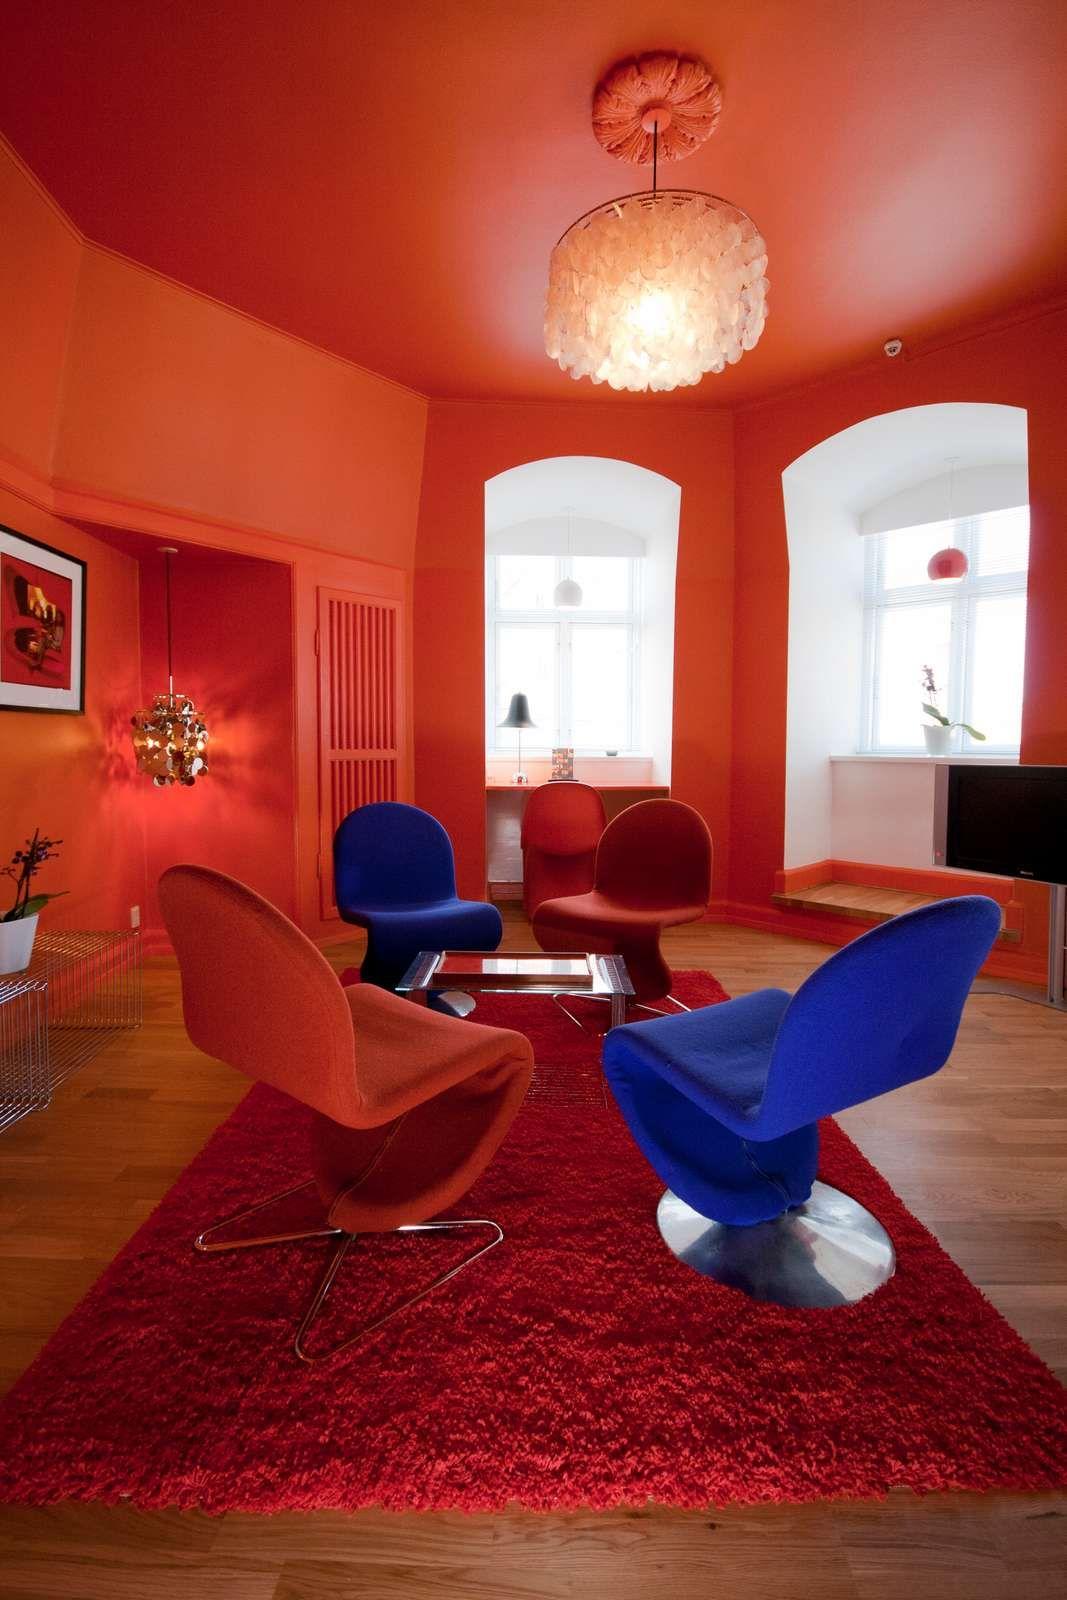 Hotel Room Furniture: Verner Panton Room In Hotel Alexandra